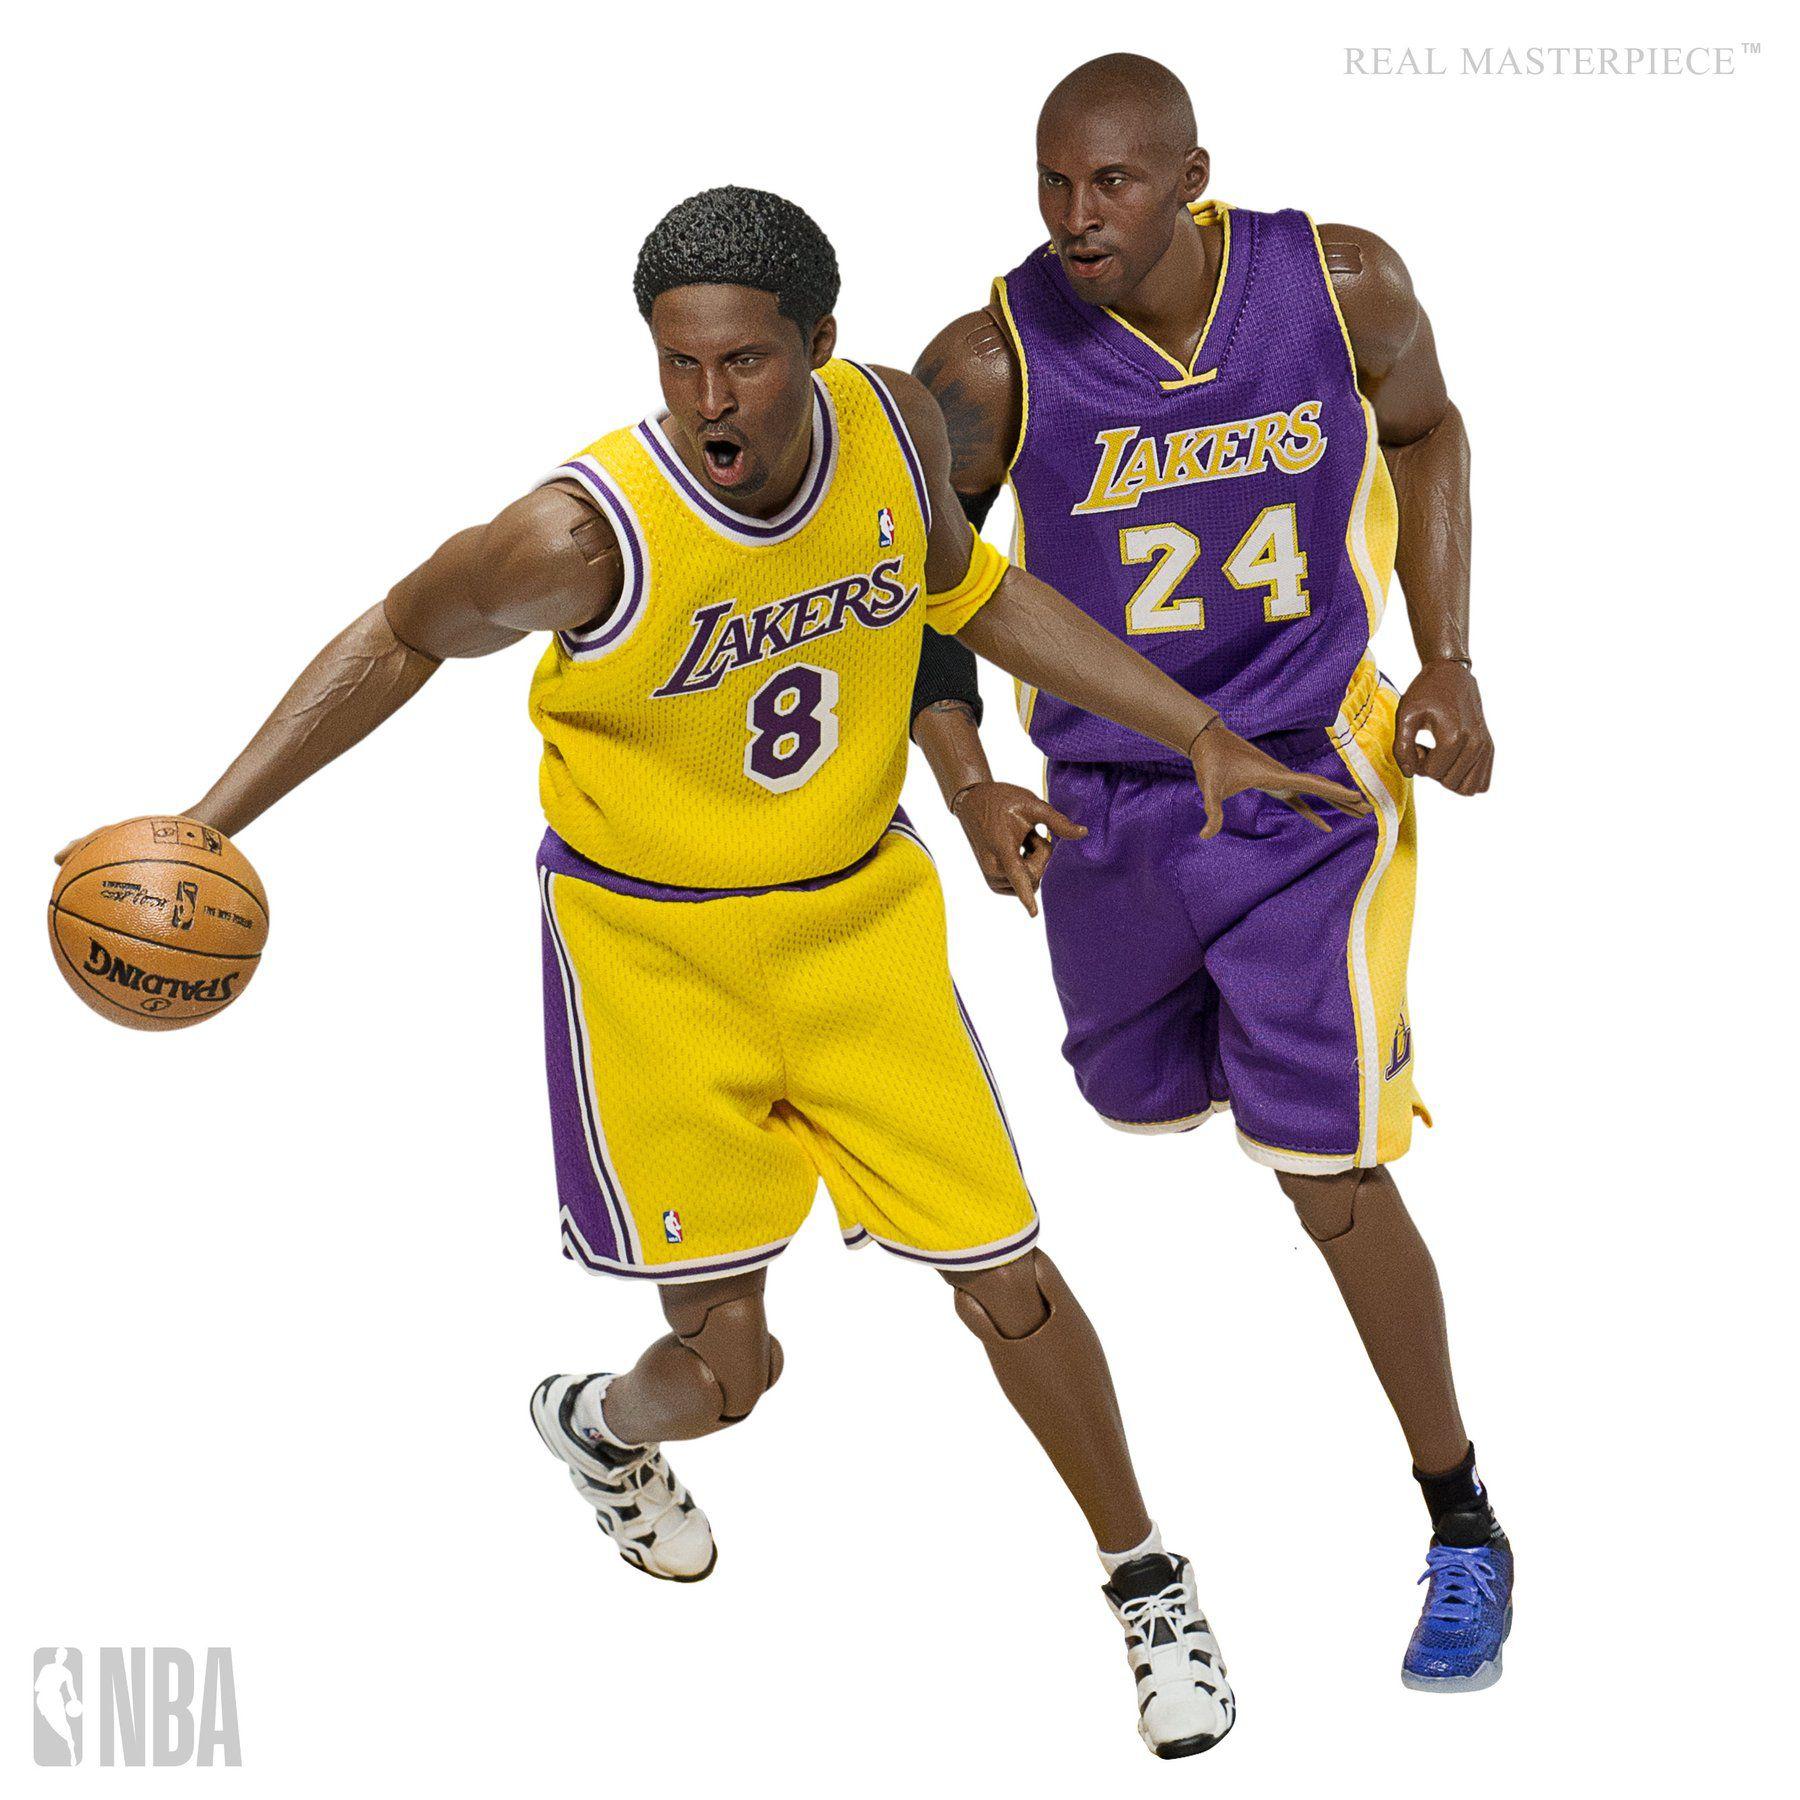 PRÉ VENDA: Action Figure Kobe Bryant (New Upgraded Re-Edition): LA Lakers (NBA Collection) Real Masterpiece (Escala 1/6) - Enterbay